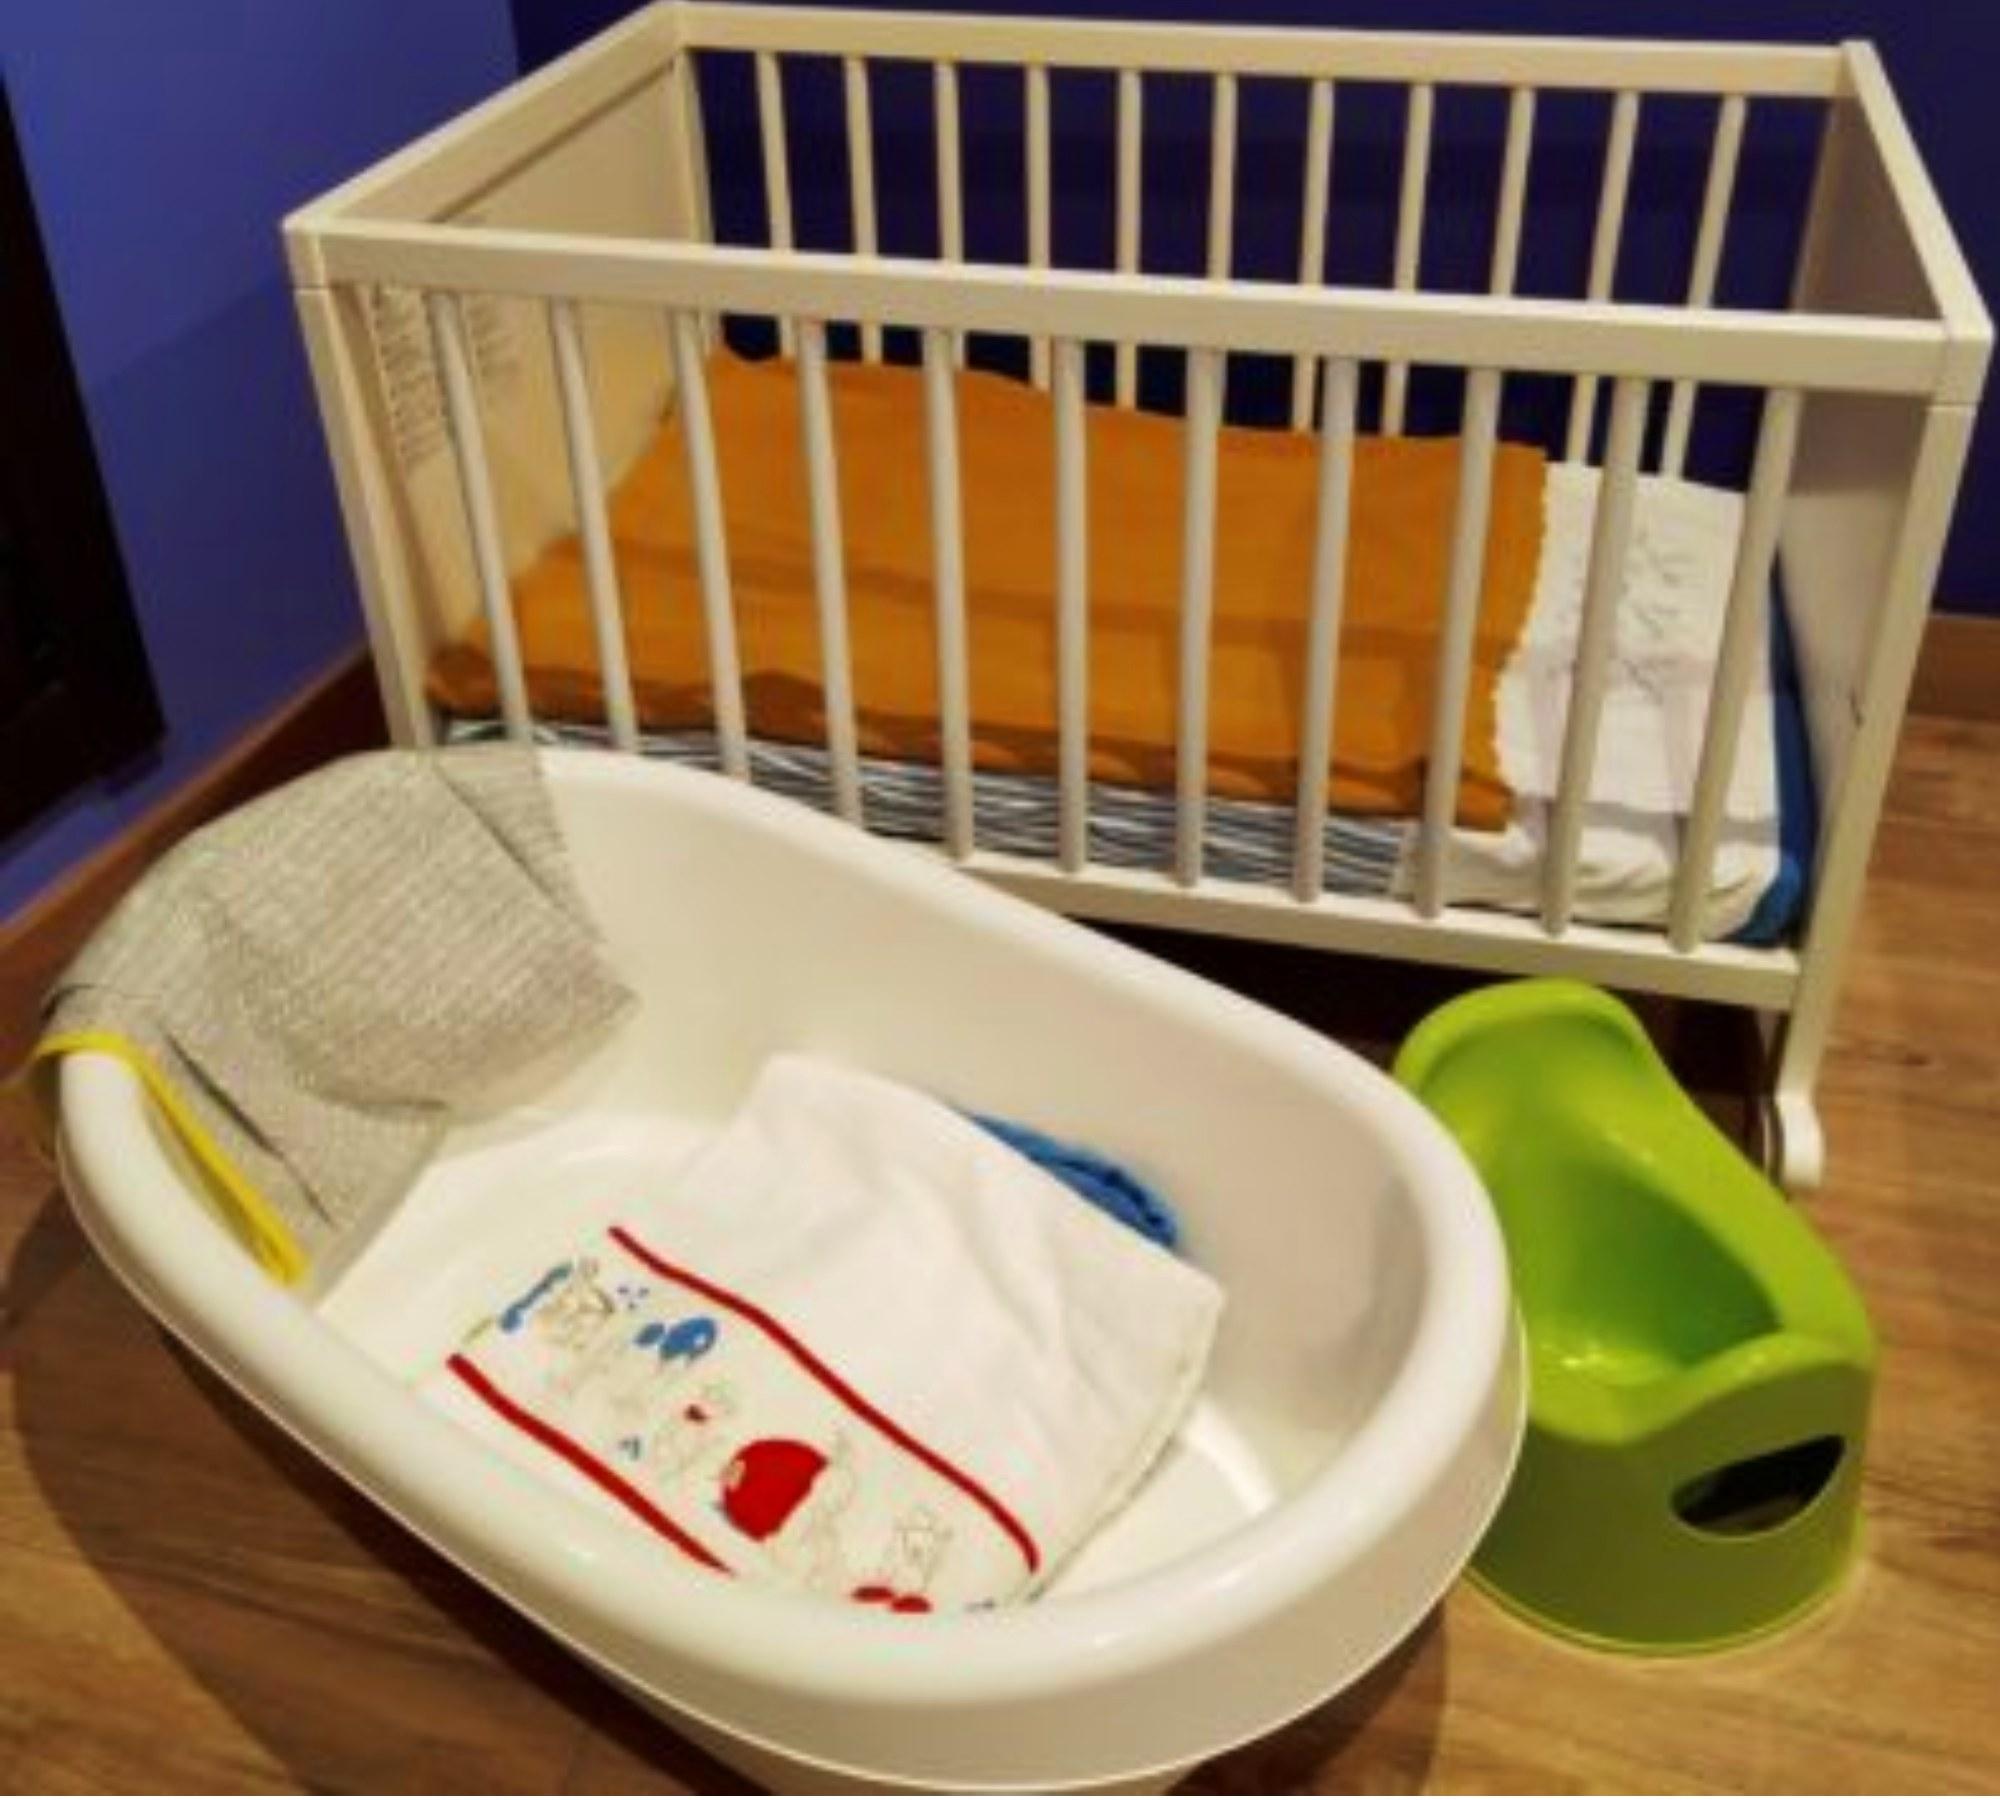 cuna-orinal-bañera-bebes-casaomillon